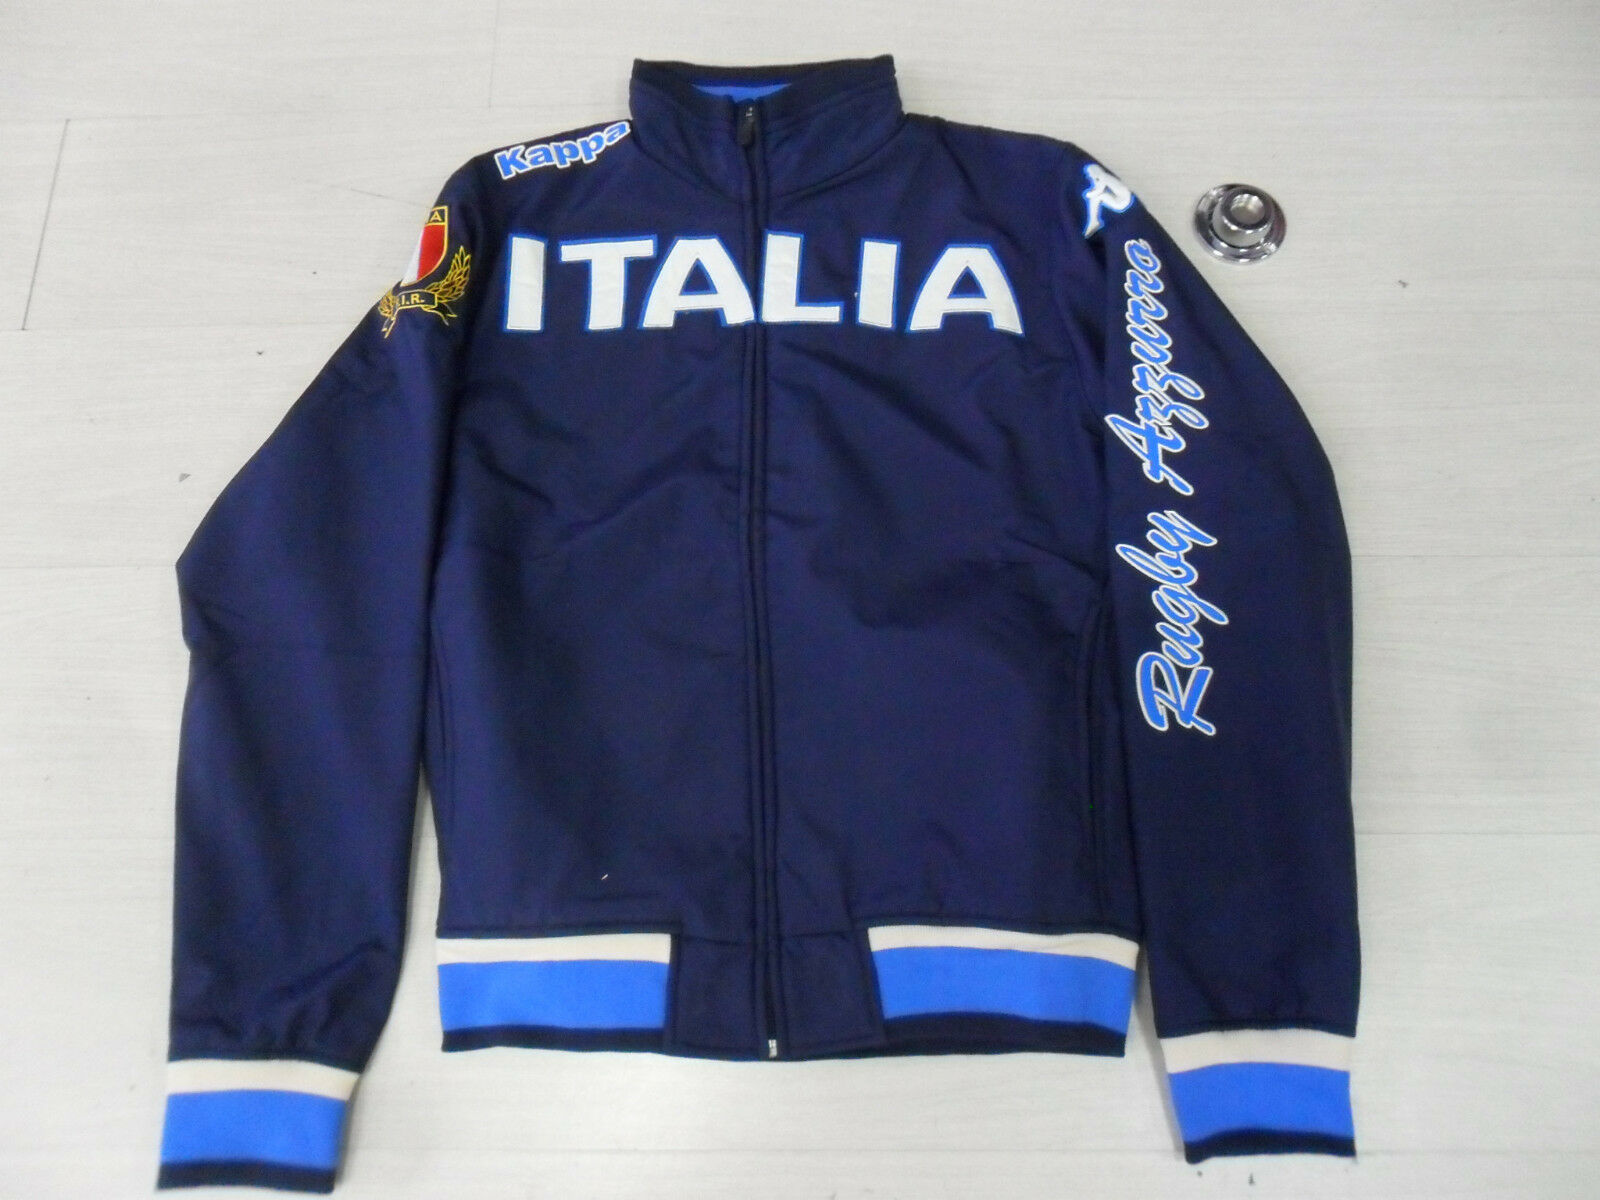 0857 TG. S ITALIA RUGBY GIACCHETTO ZIP EROI JACKET FULL ZIP TOP GIACCA FIR